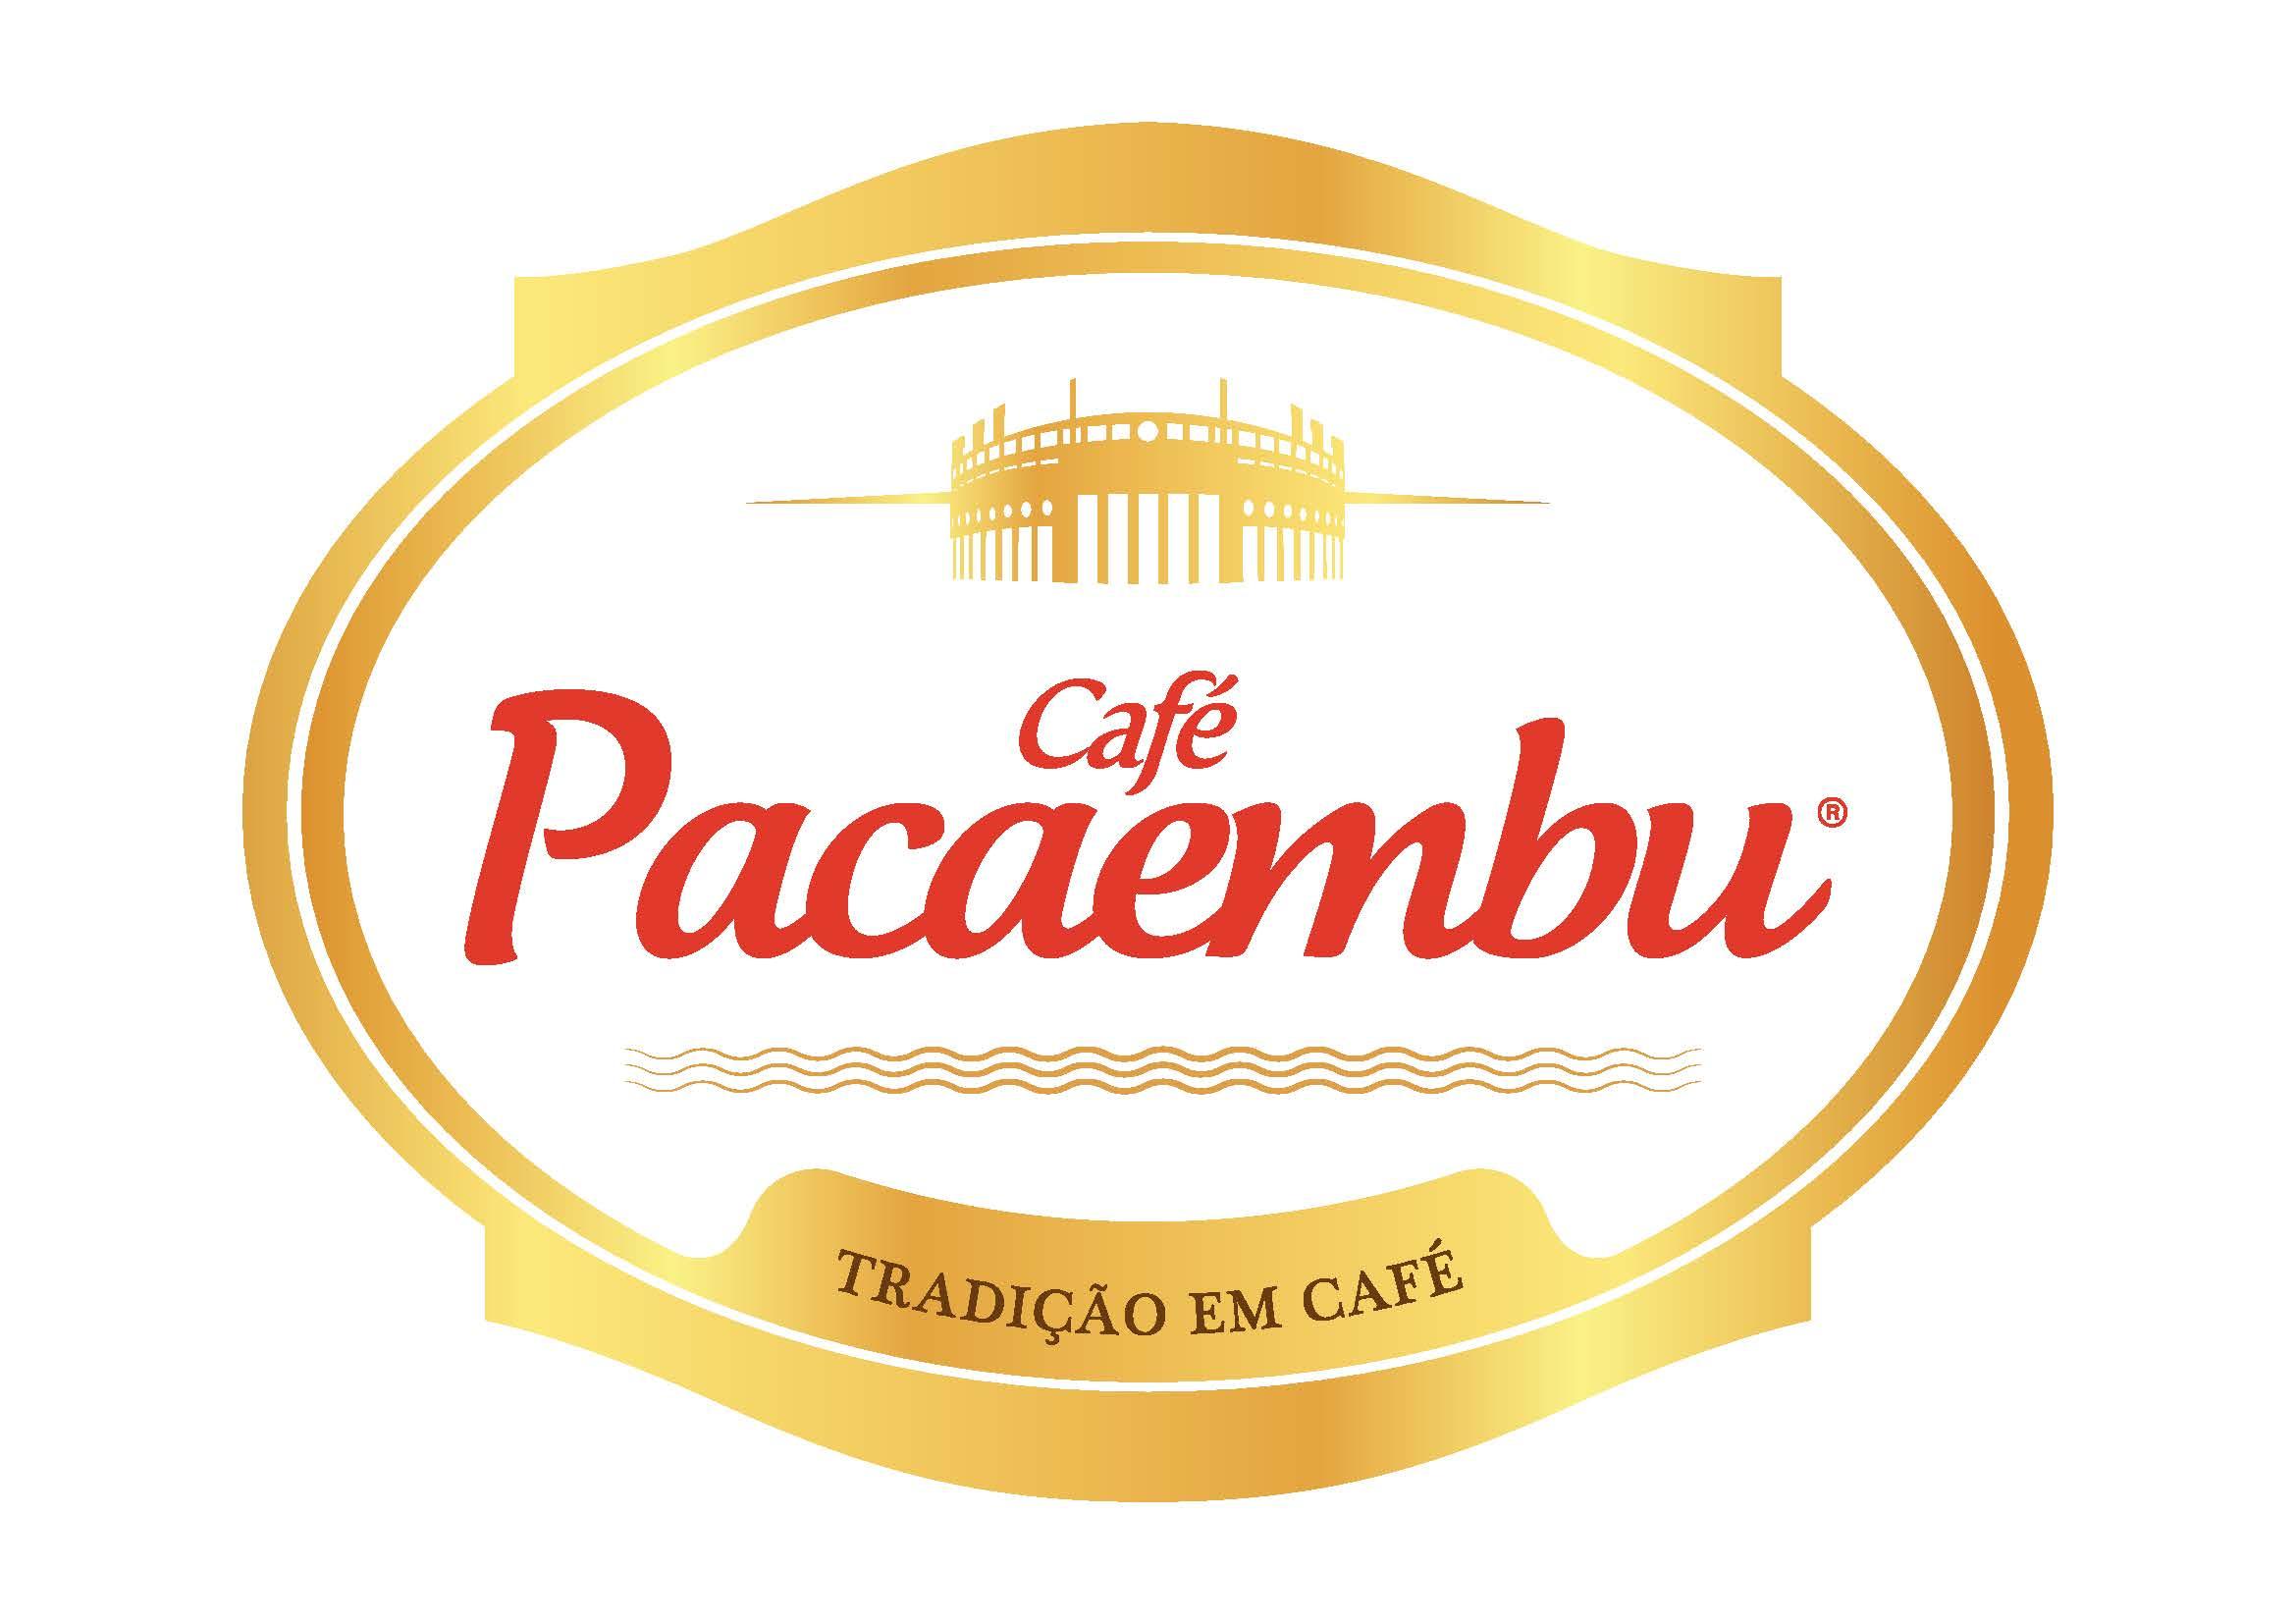 Café Capaembu e Massimo Zanetti Beverage Group